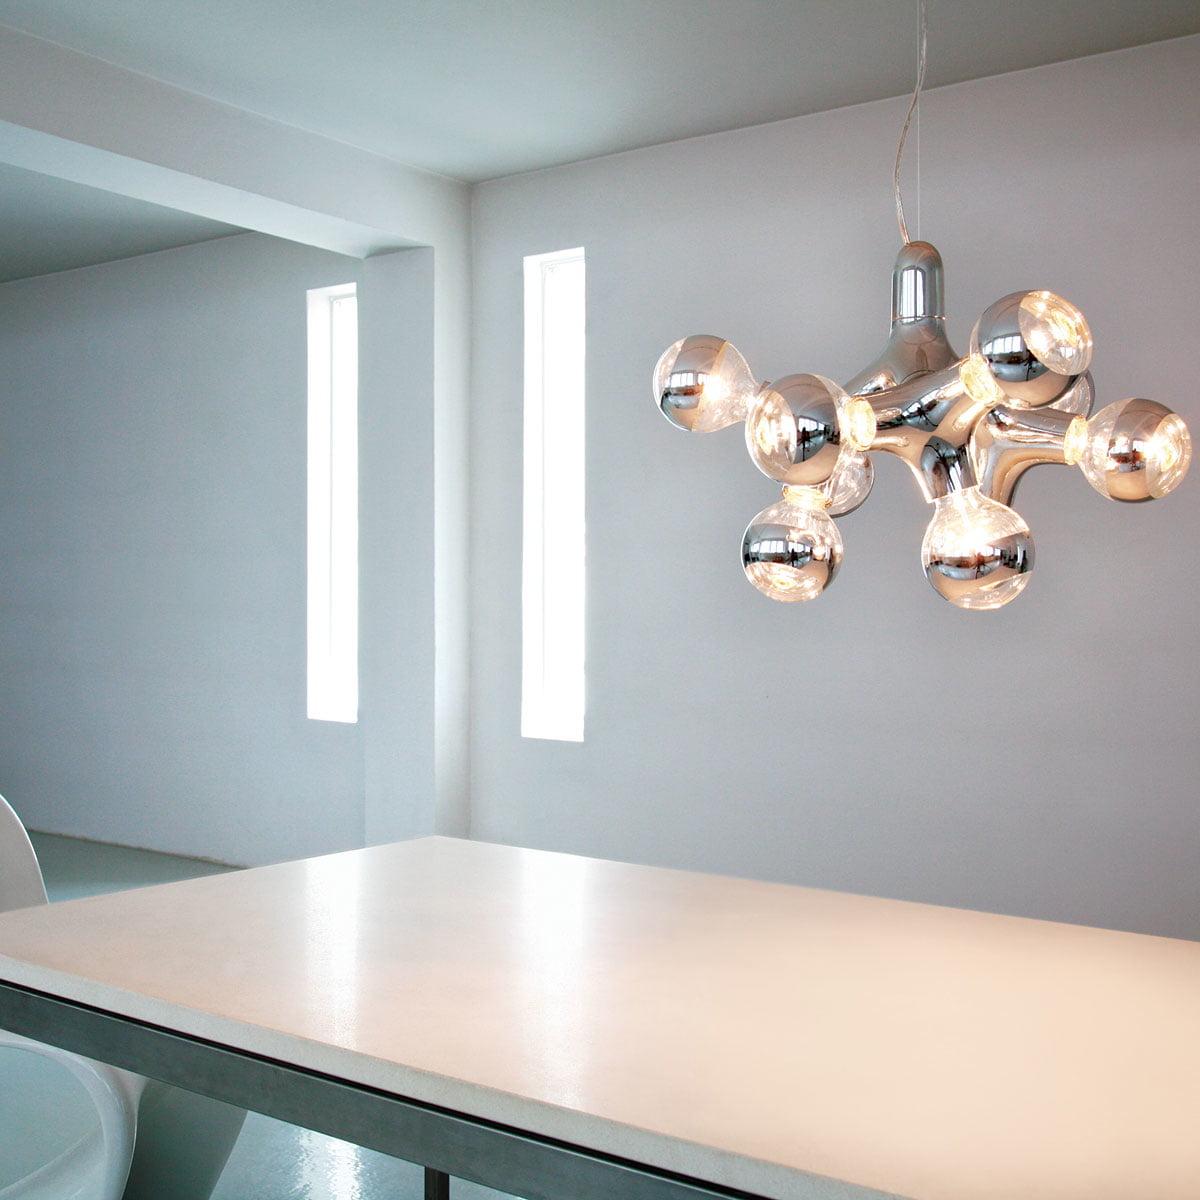 Dna Pendant Lamp By Hopf Wortmann For